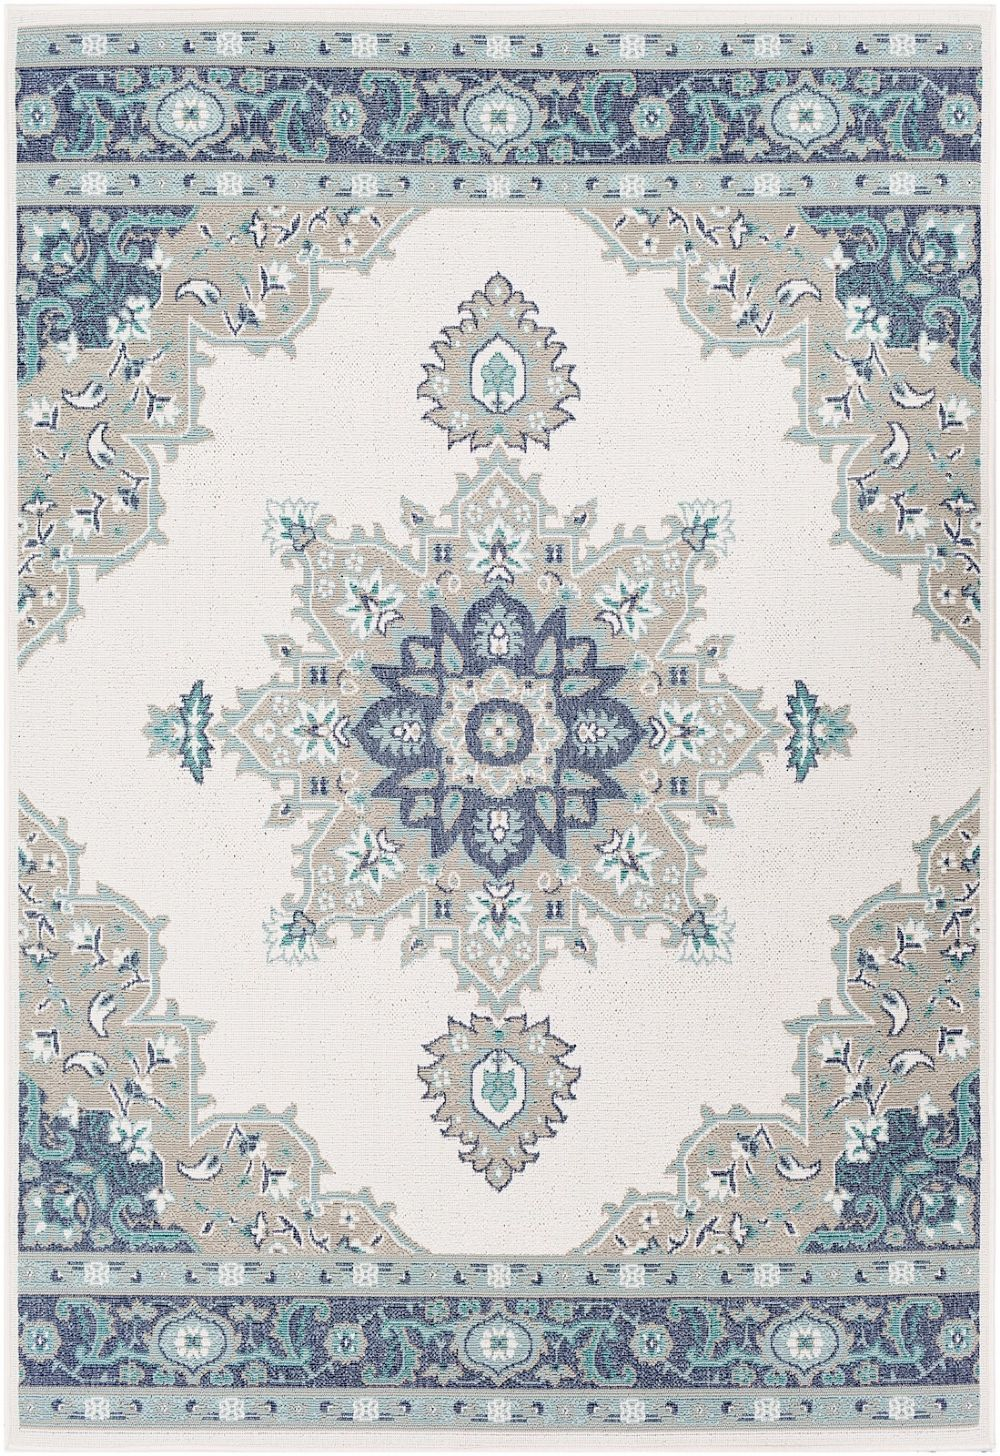 surya alfresco indoor/outdoor area rug collection